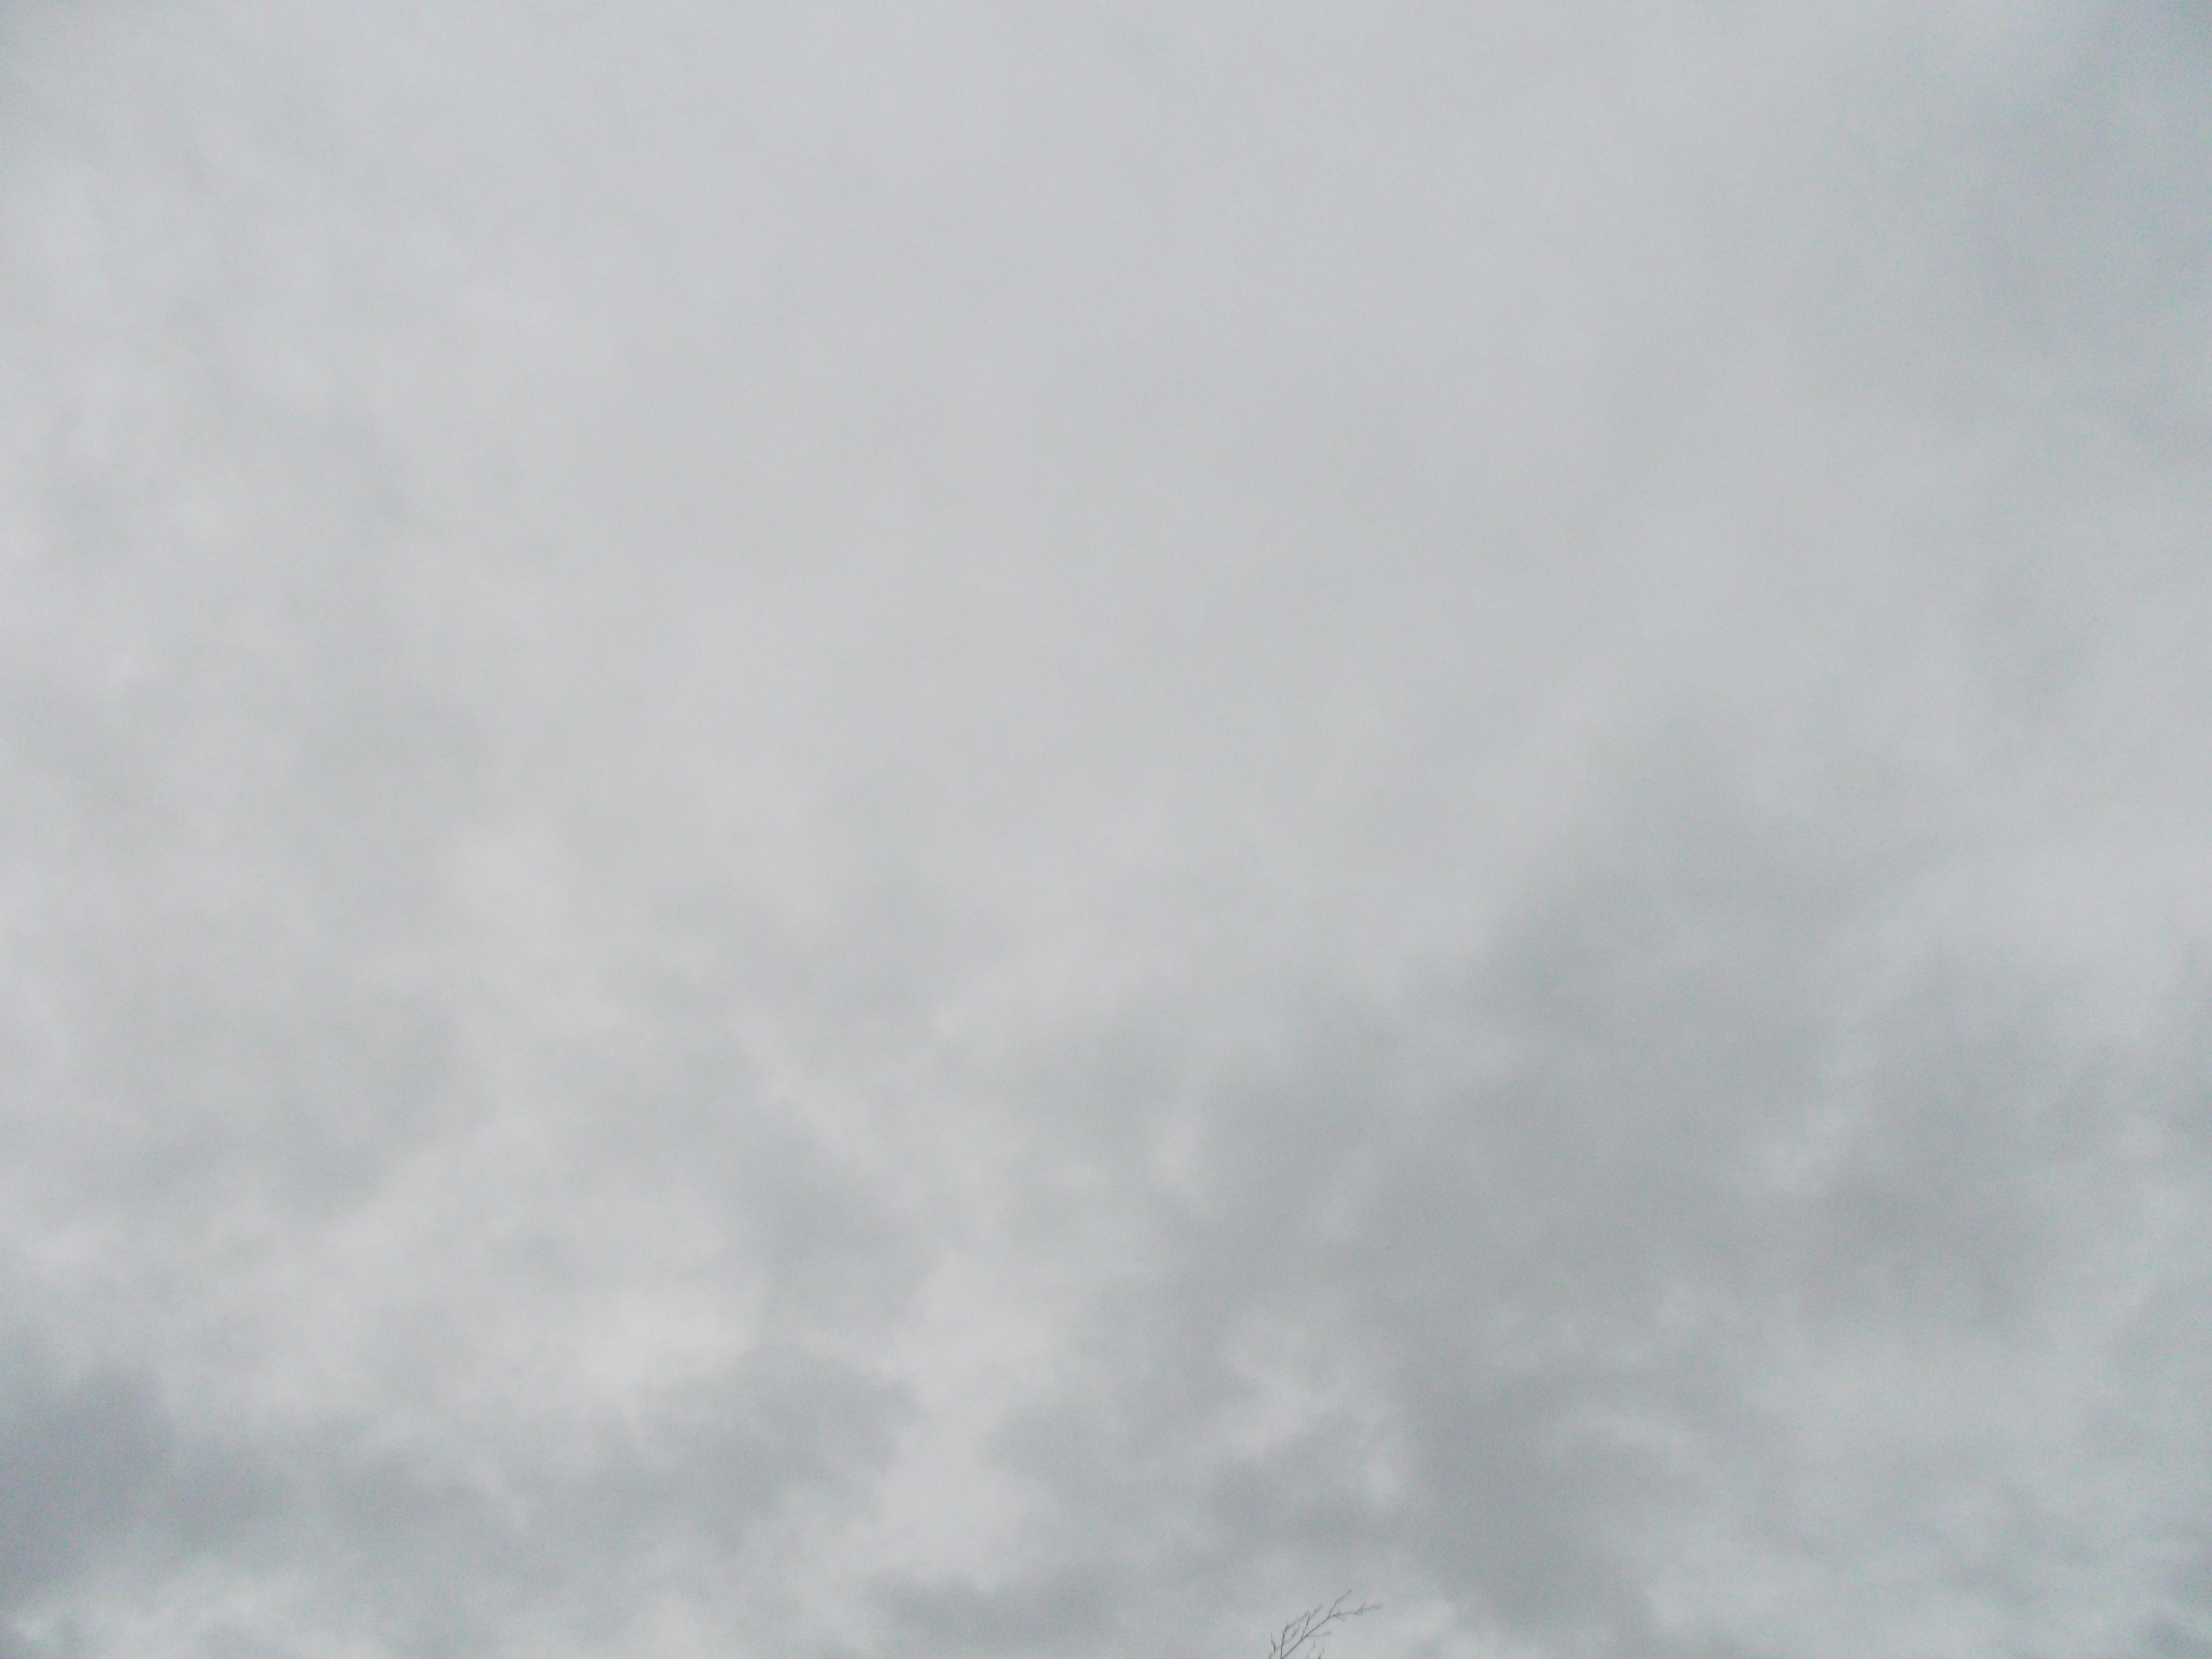 2013-01-28 Longitude -0.371 Latitude 49.182 Altitude 13 Heure 12h55